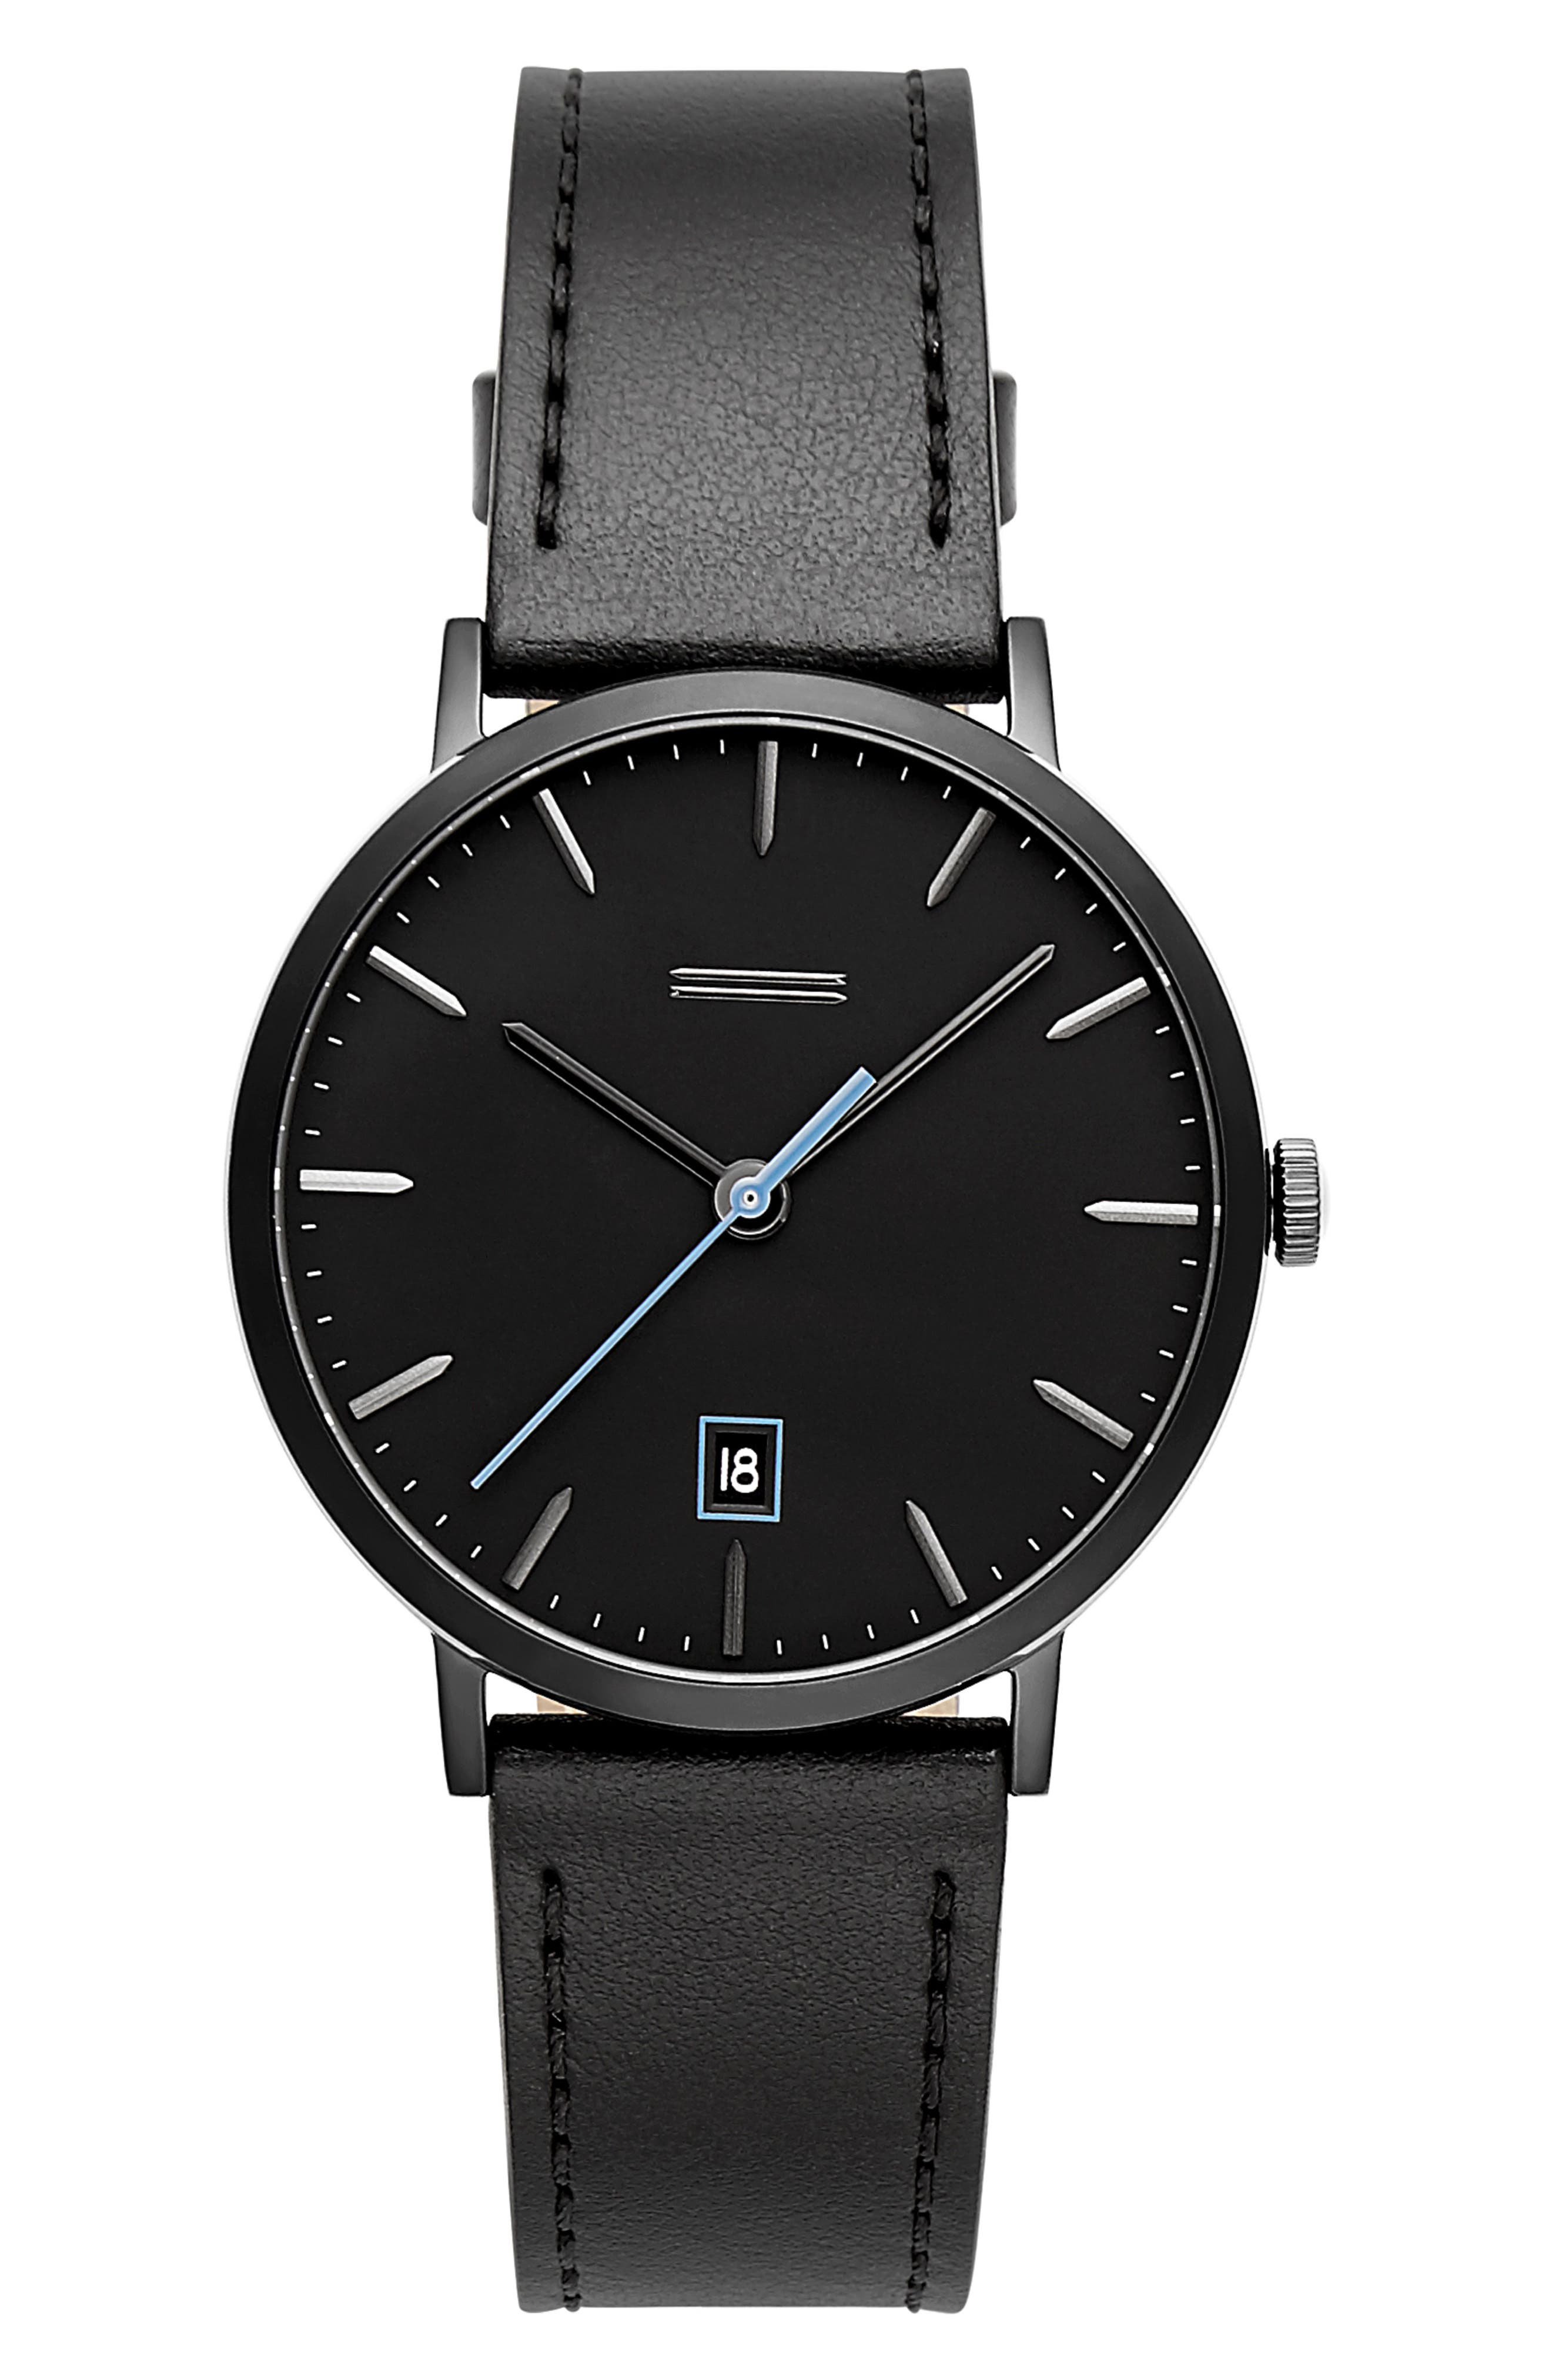 URI MINKOFF Norrebro Leather Watch, 40Mm in Black